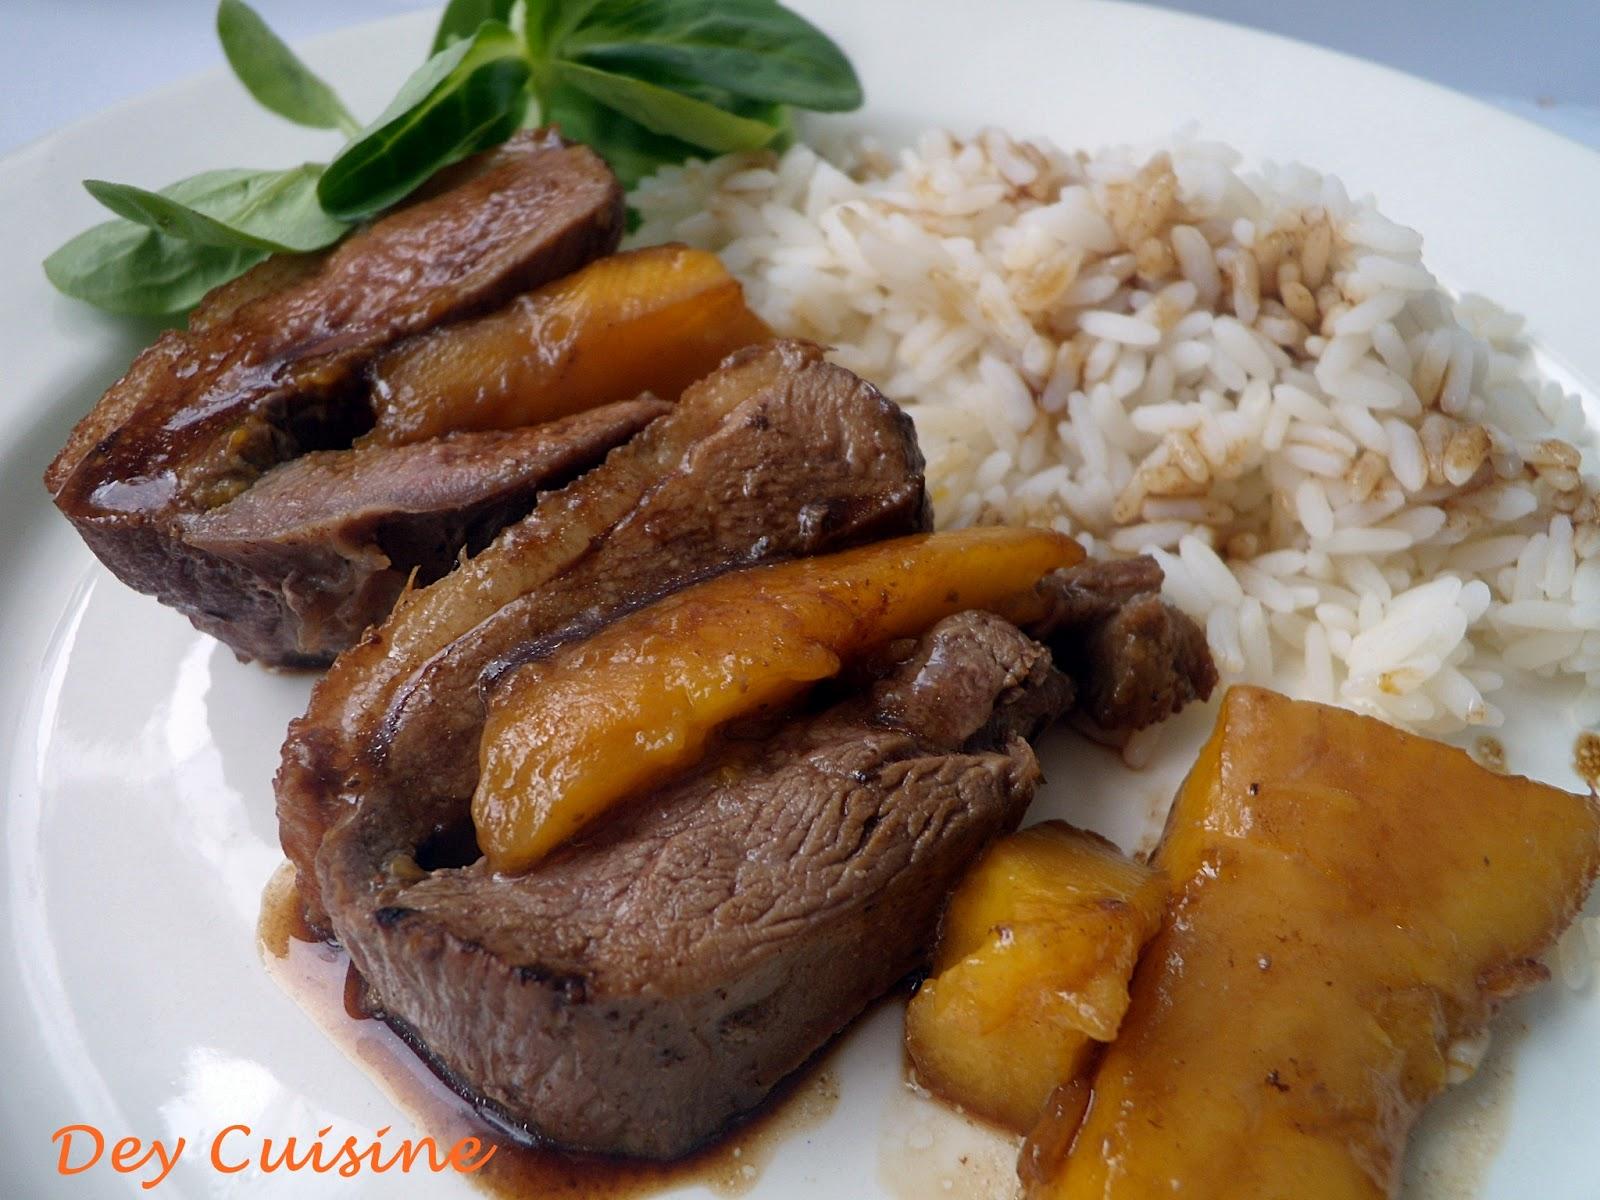 Dey cuisine r ti de canard la mangue - Cuisiner un filet de canard ...